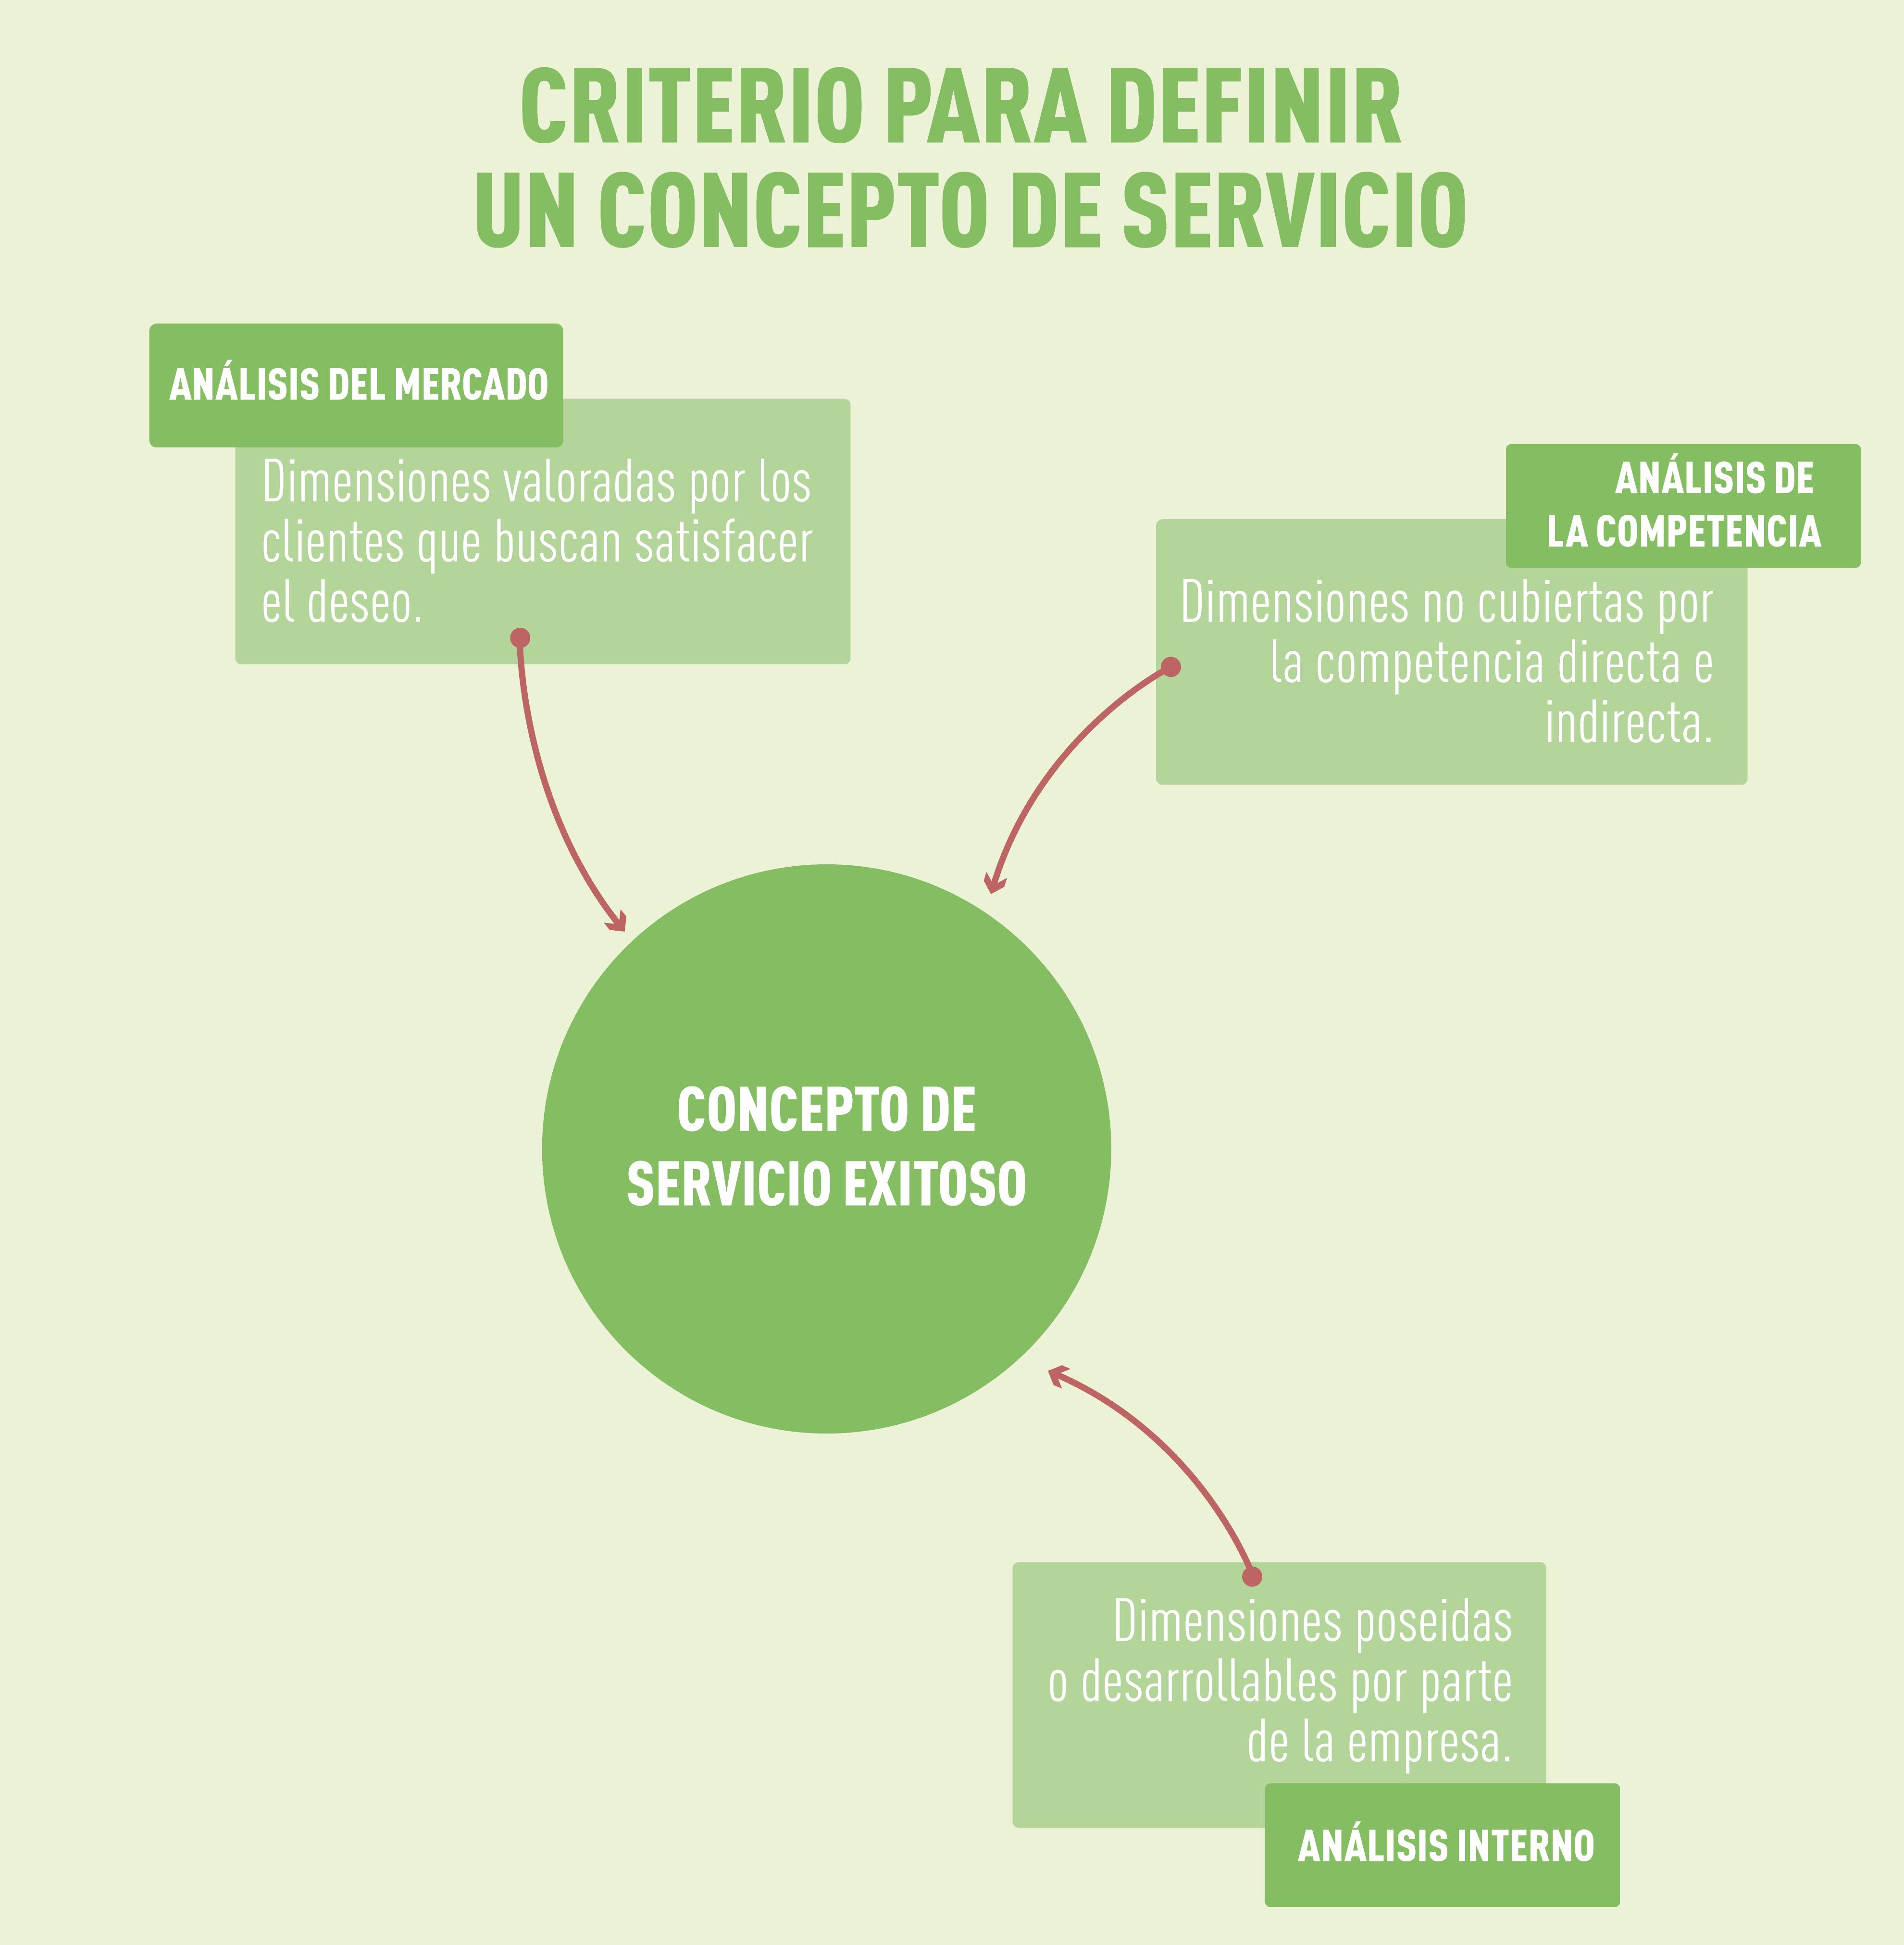 concepto de servicio